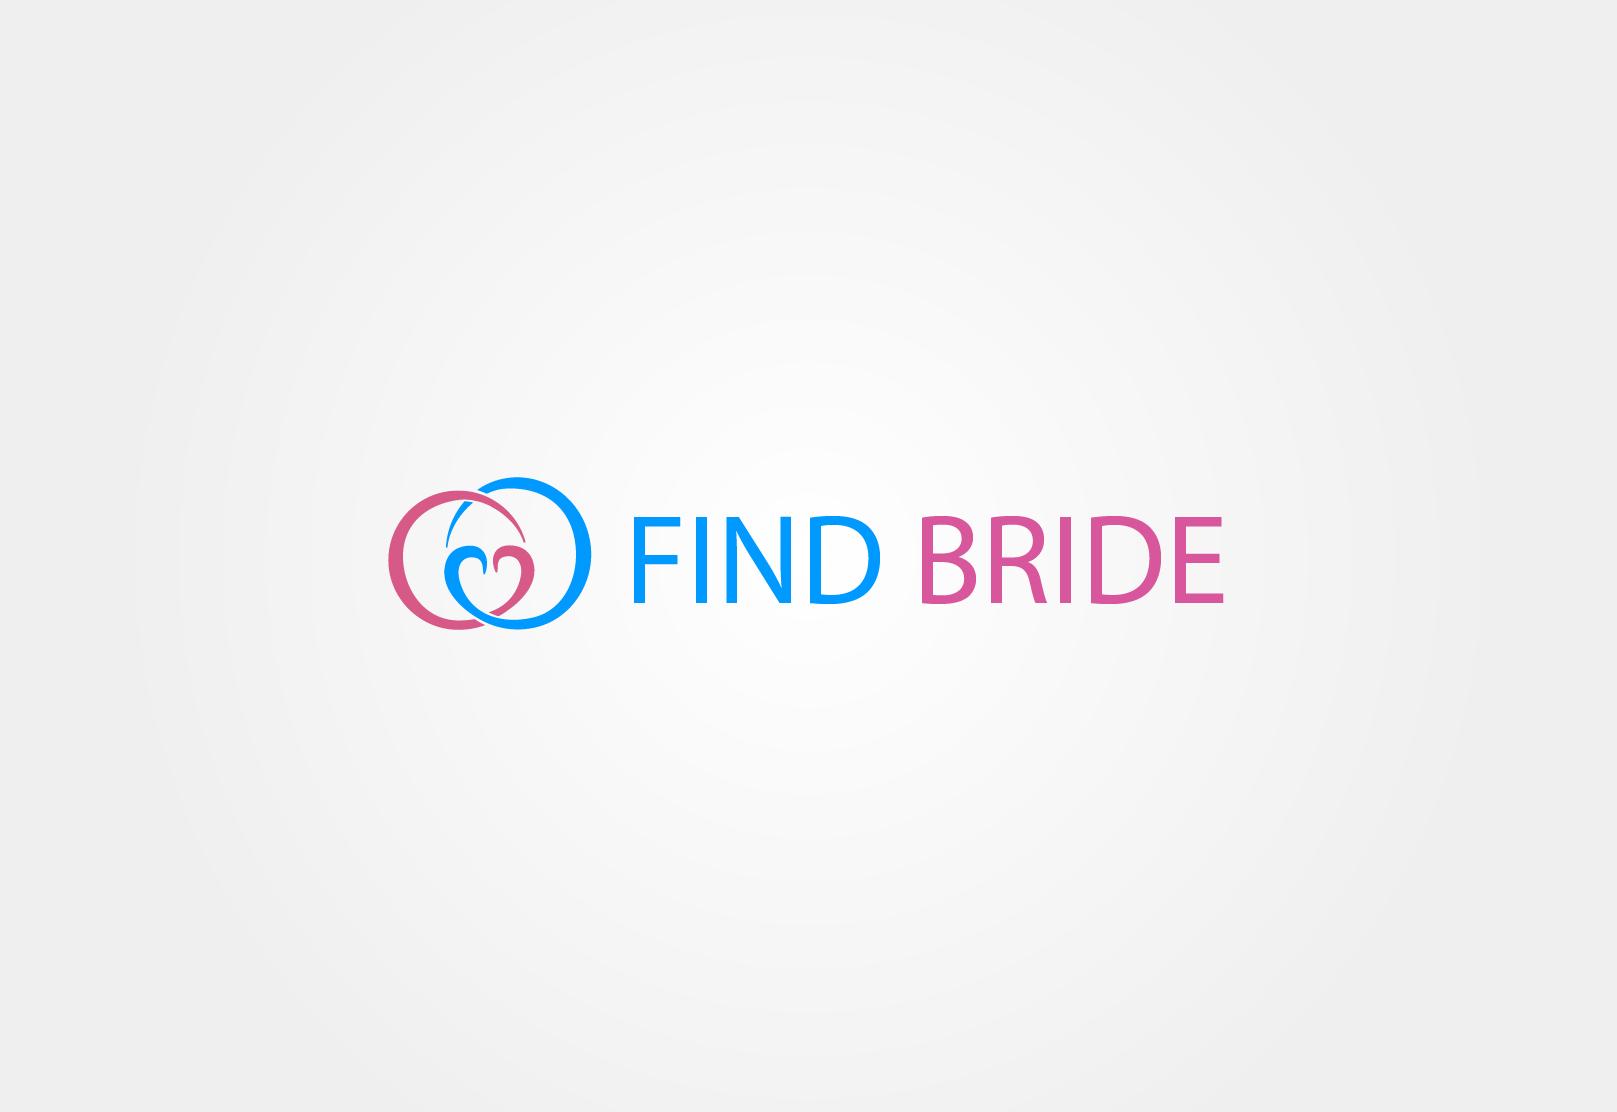 Нарисовать логотип сайта знакомств фото f_3365accdac3f1c2e.png